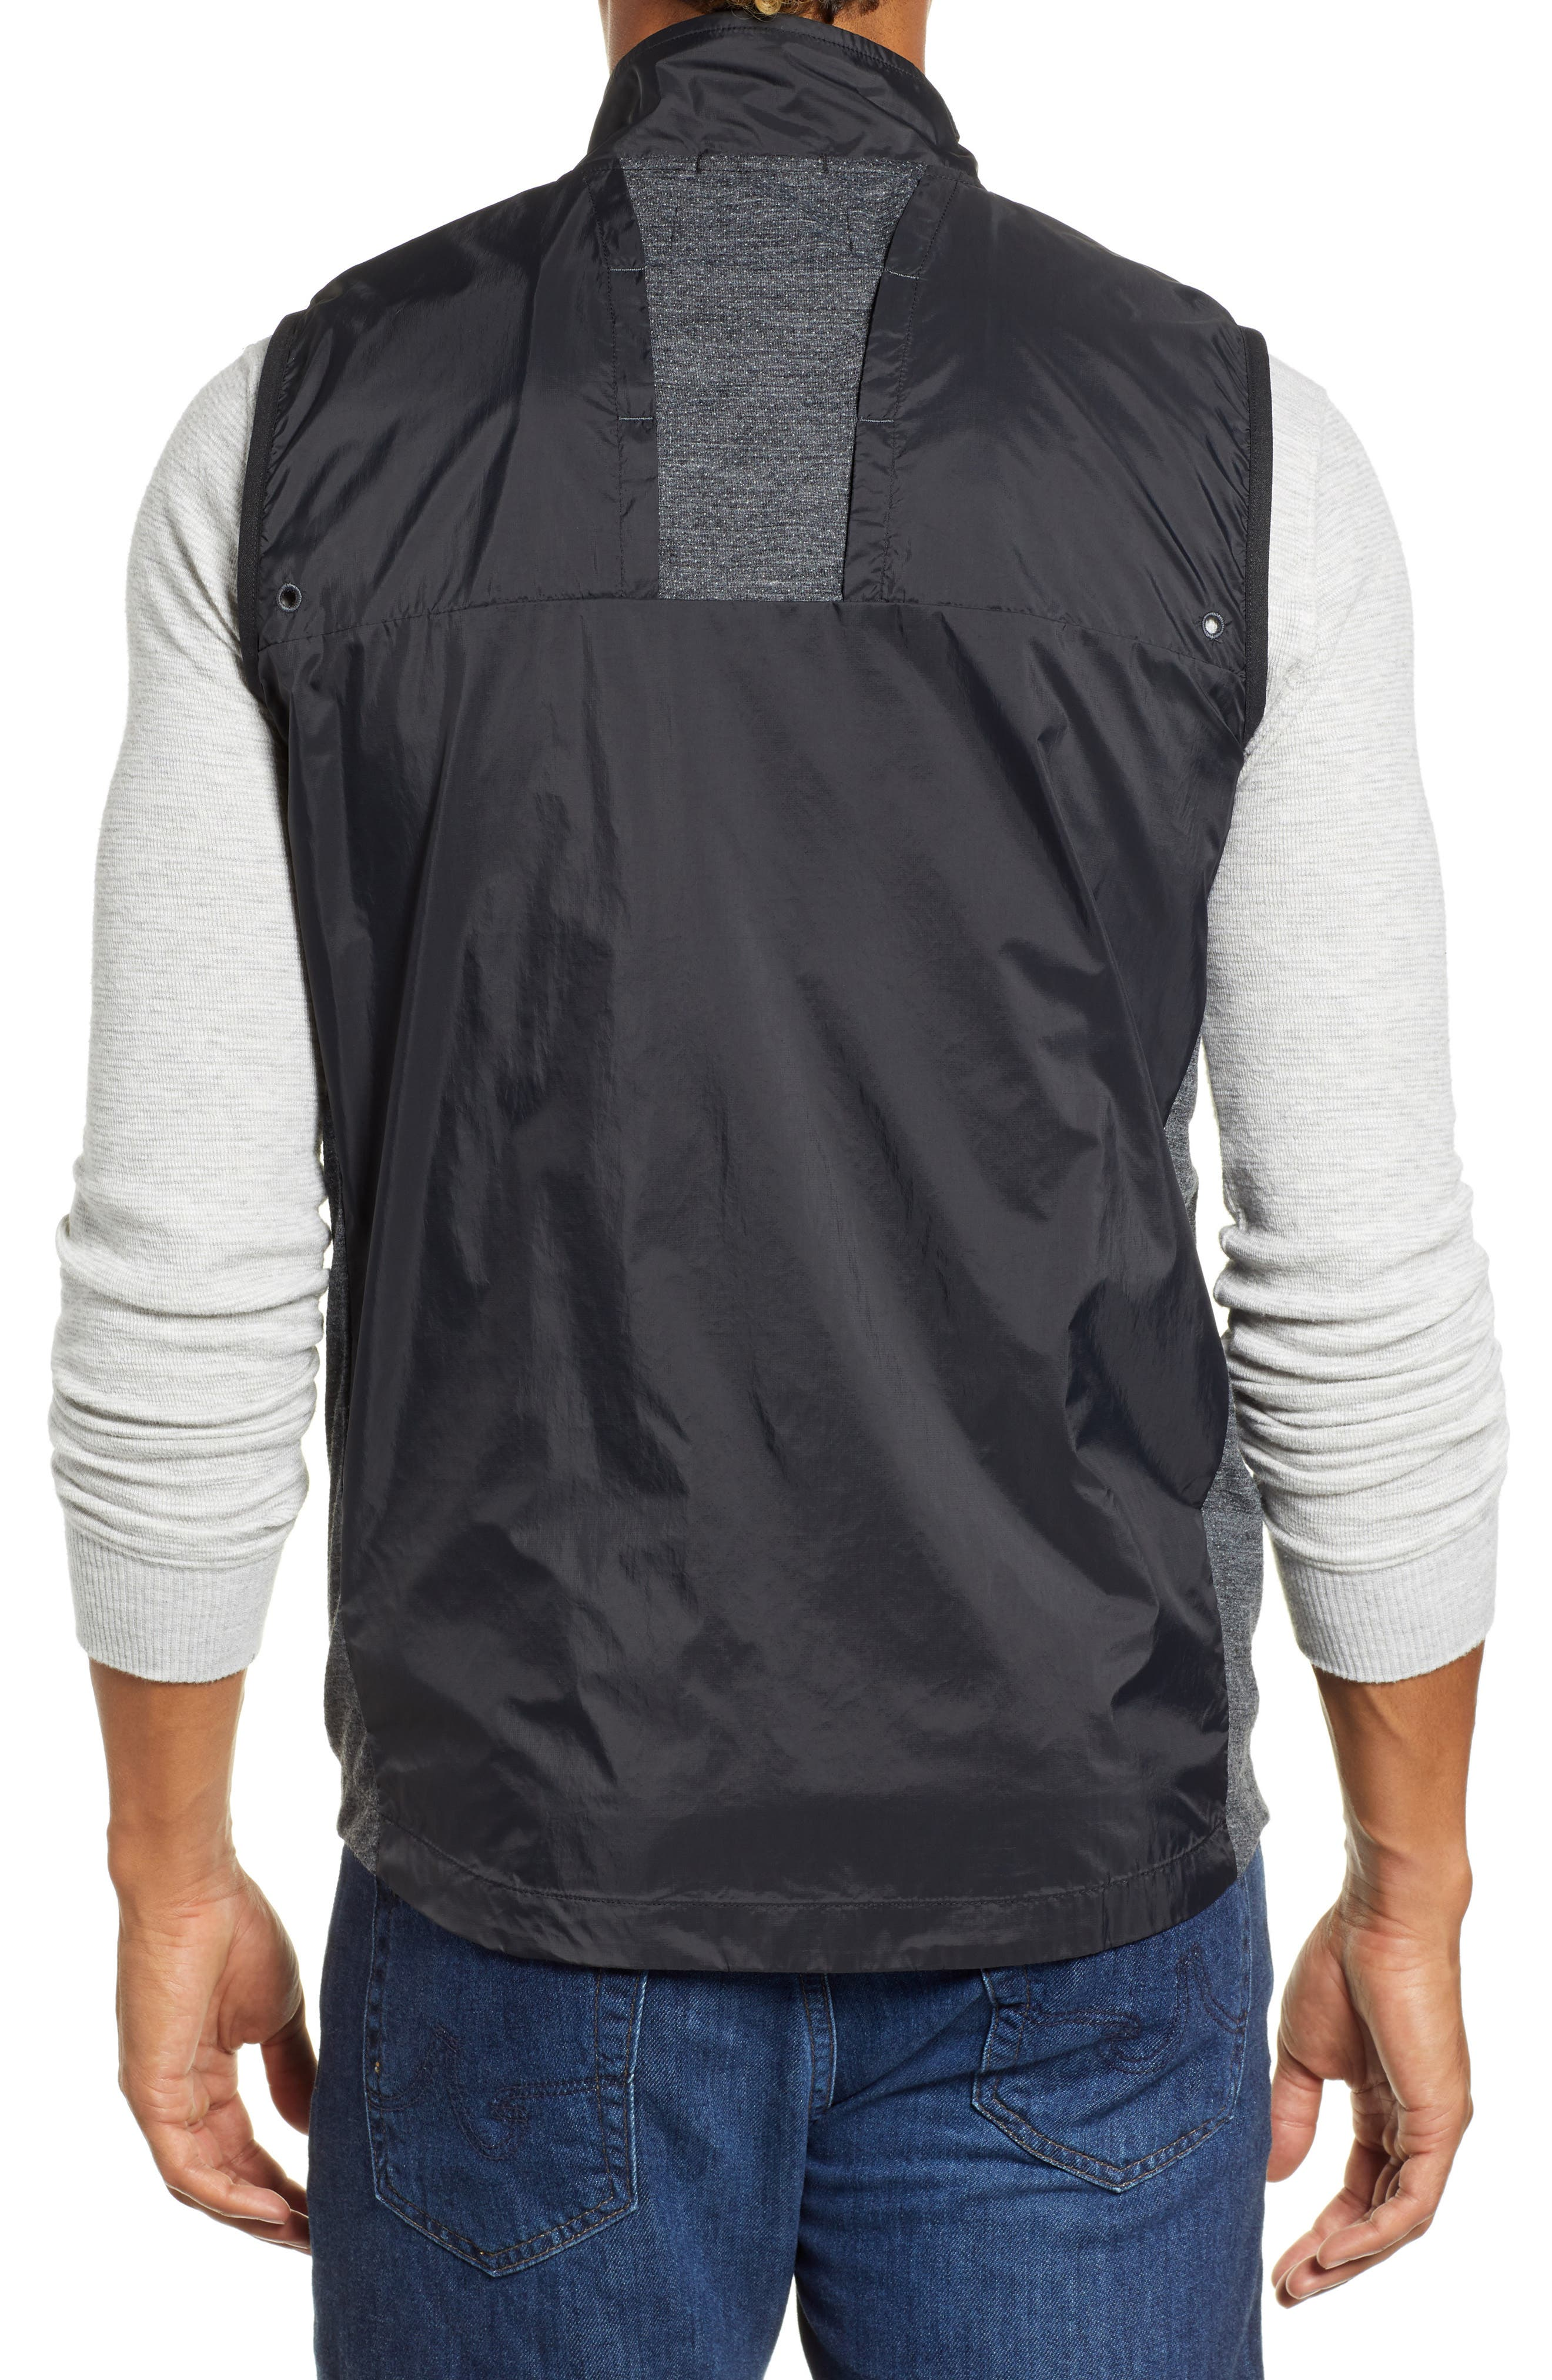 PhD<sup>®</sup> Ultra Light Sport Vest,                             Alternate thumbnail 2, color,                             BLACK